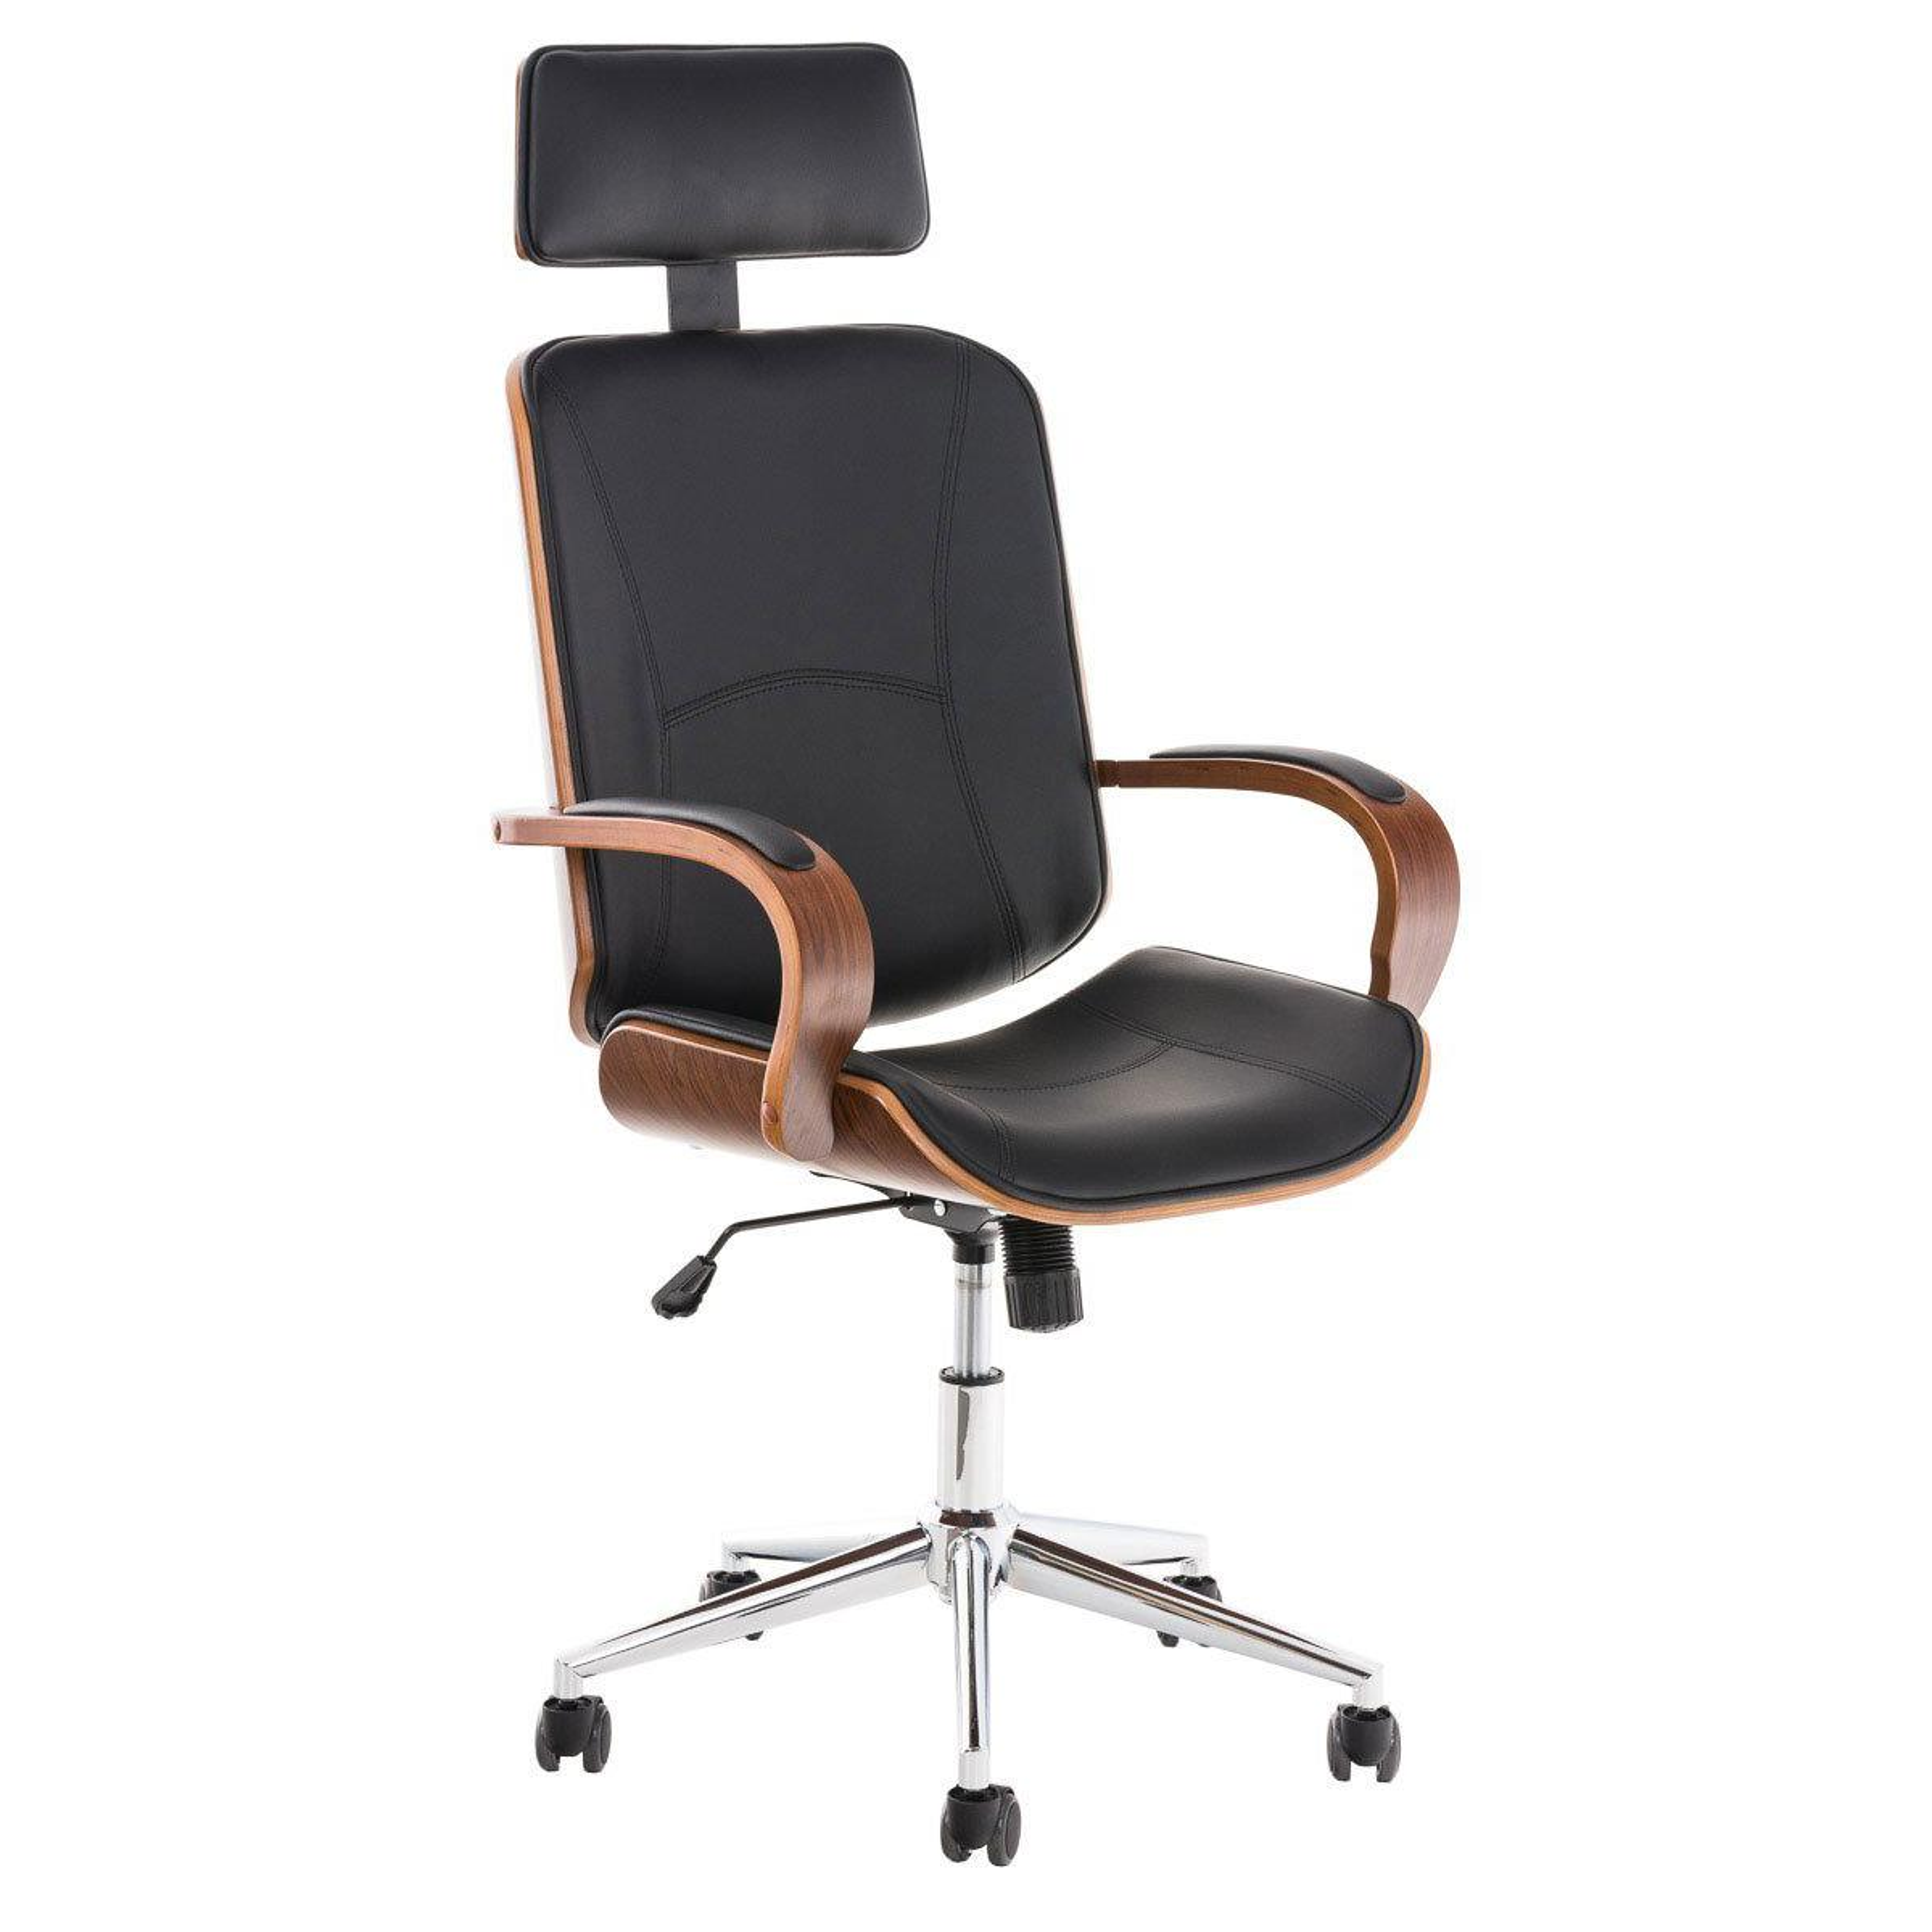 Silla de oficina jutta en color negro silla de oficina for Silla oficina diseno